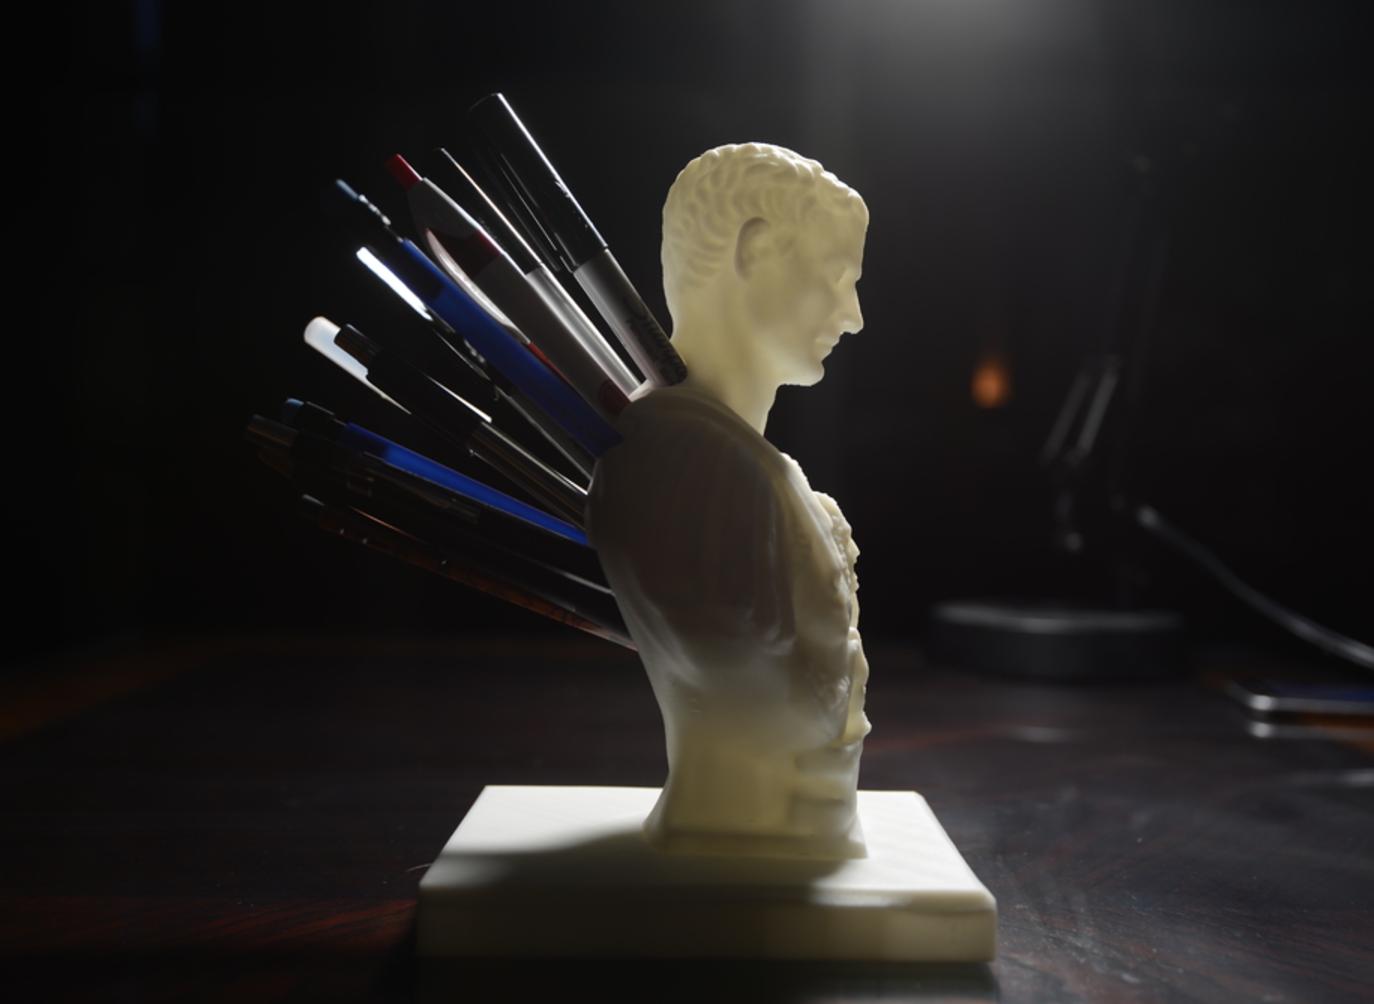 Capture d'écran 2017-09-18 à 11.03.30.png Download free STL file Julius Caesar (Improved) Pen/Pencil Holder • 3D printer model, derailed